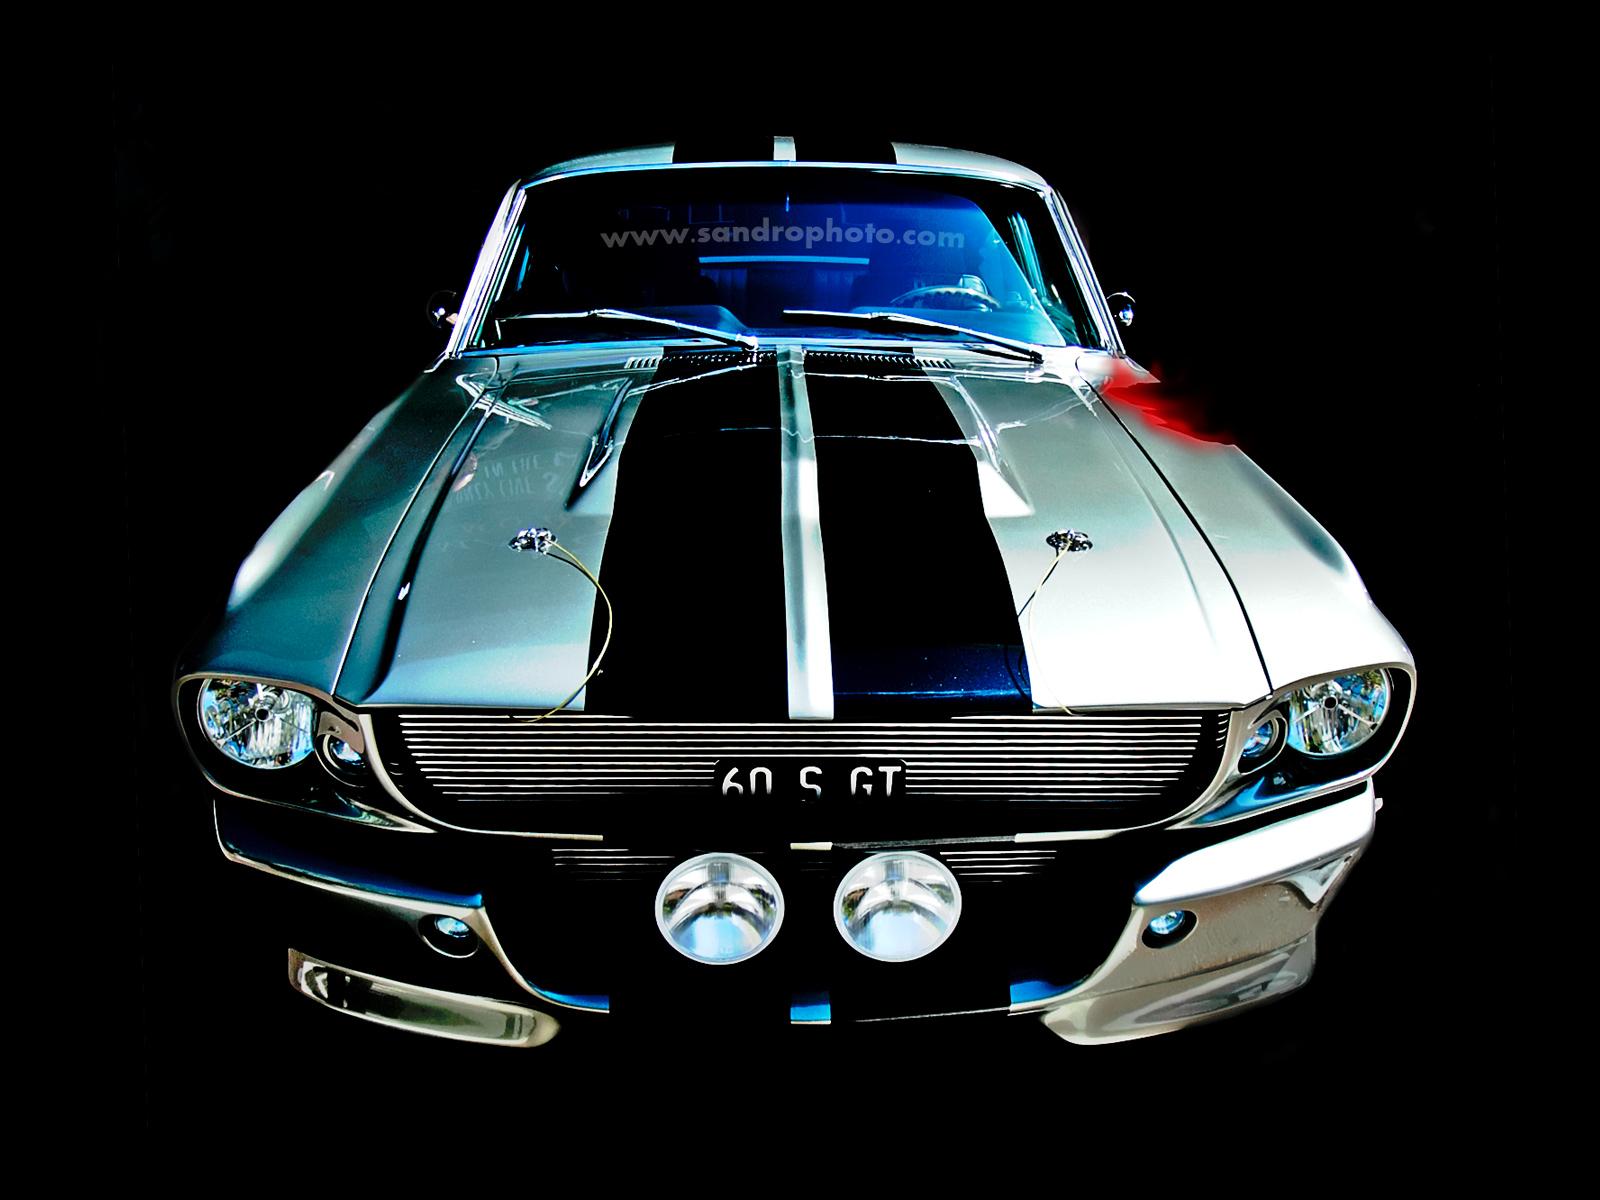 Hd cool car wallpapers - Car desktop wallpaper ...